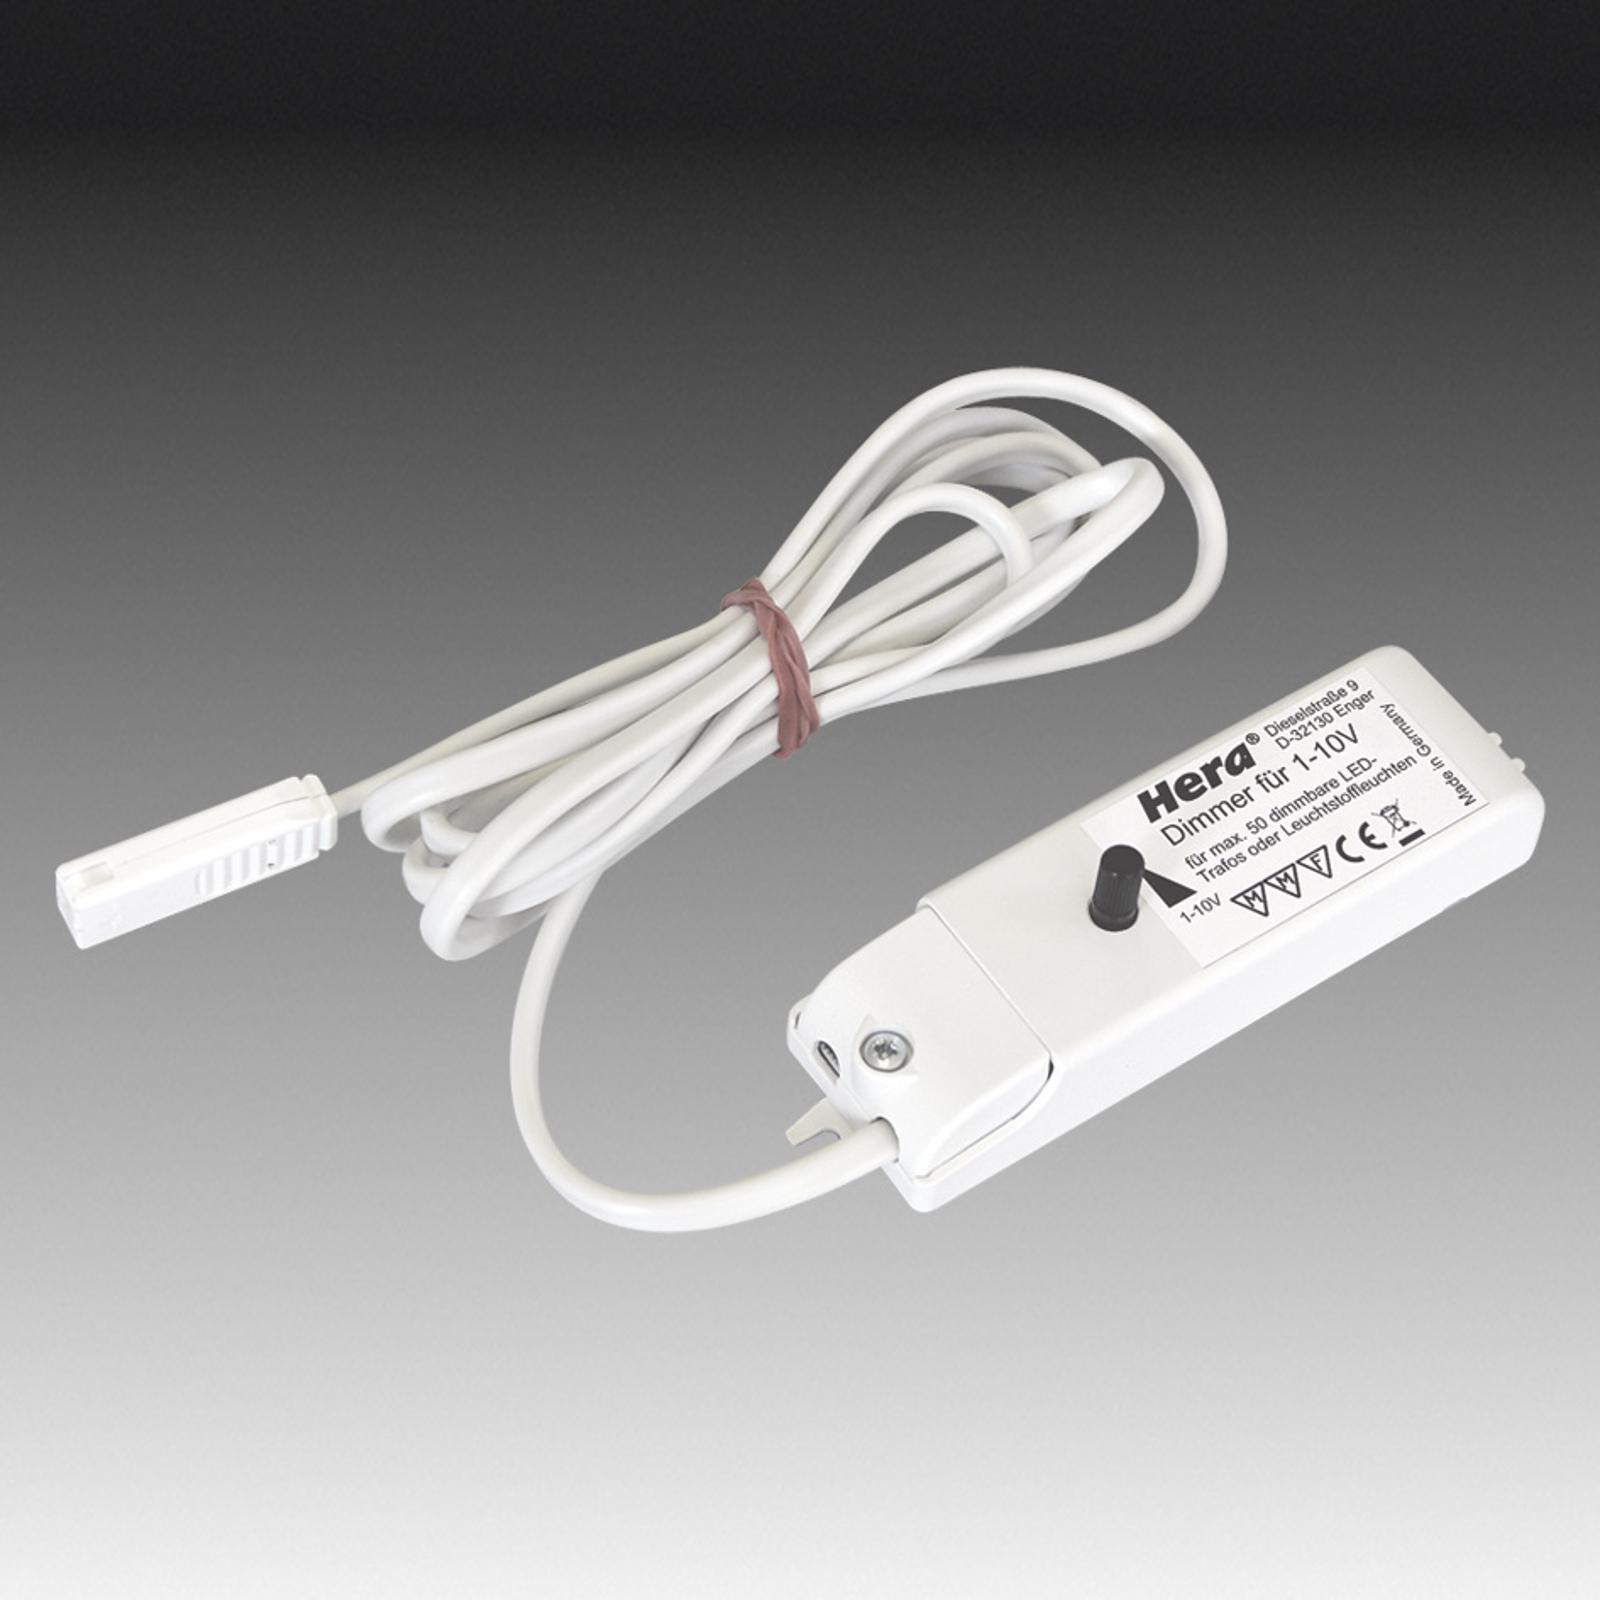 Anbaudimmer für LED STICK 2